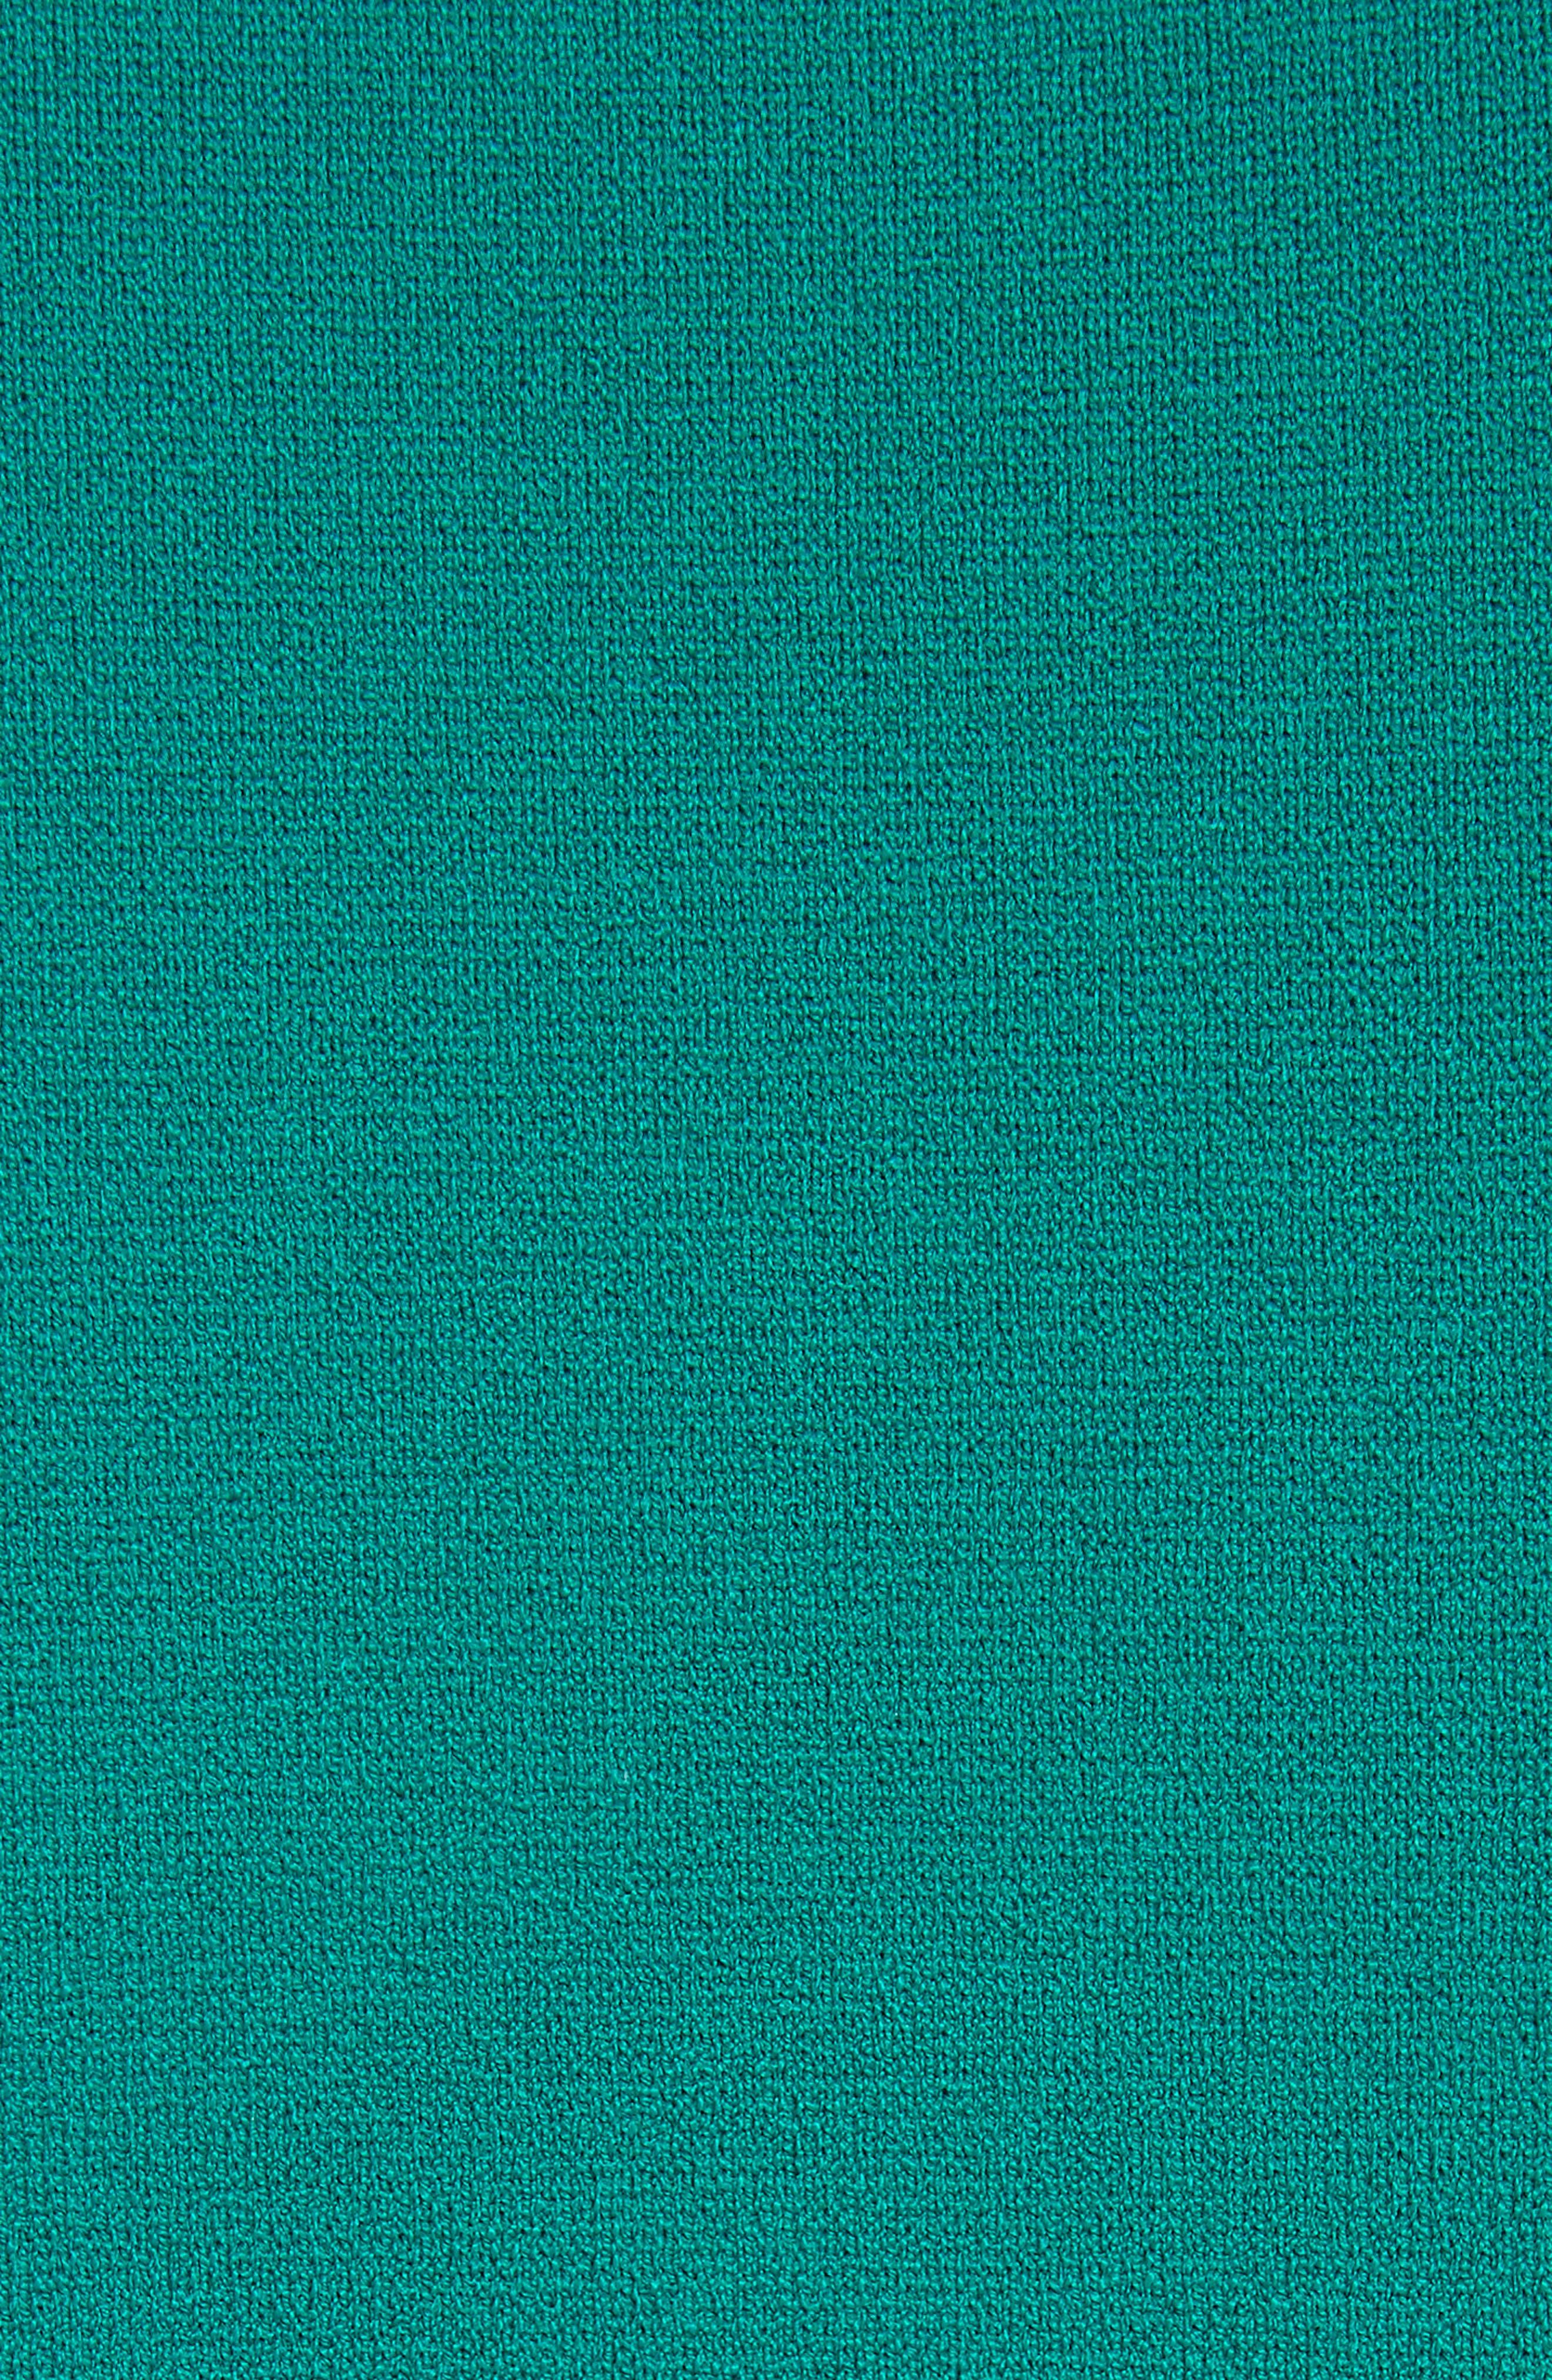 Diane von Furstenberg Stripe Short Sleeve Sweater Dress,                             Alternate thumbnail 5, color,                             386